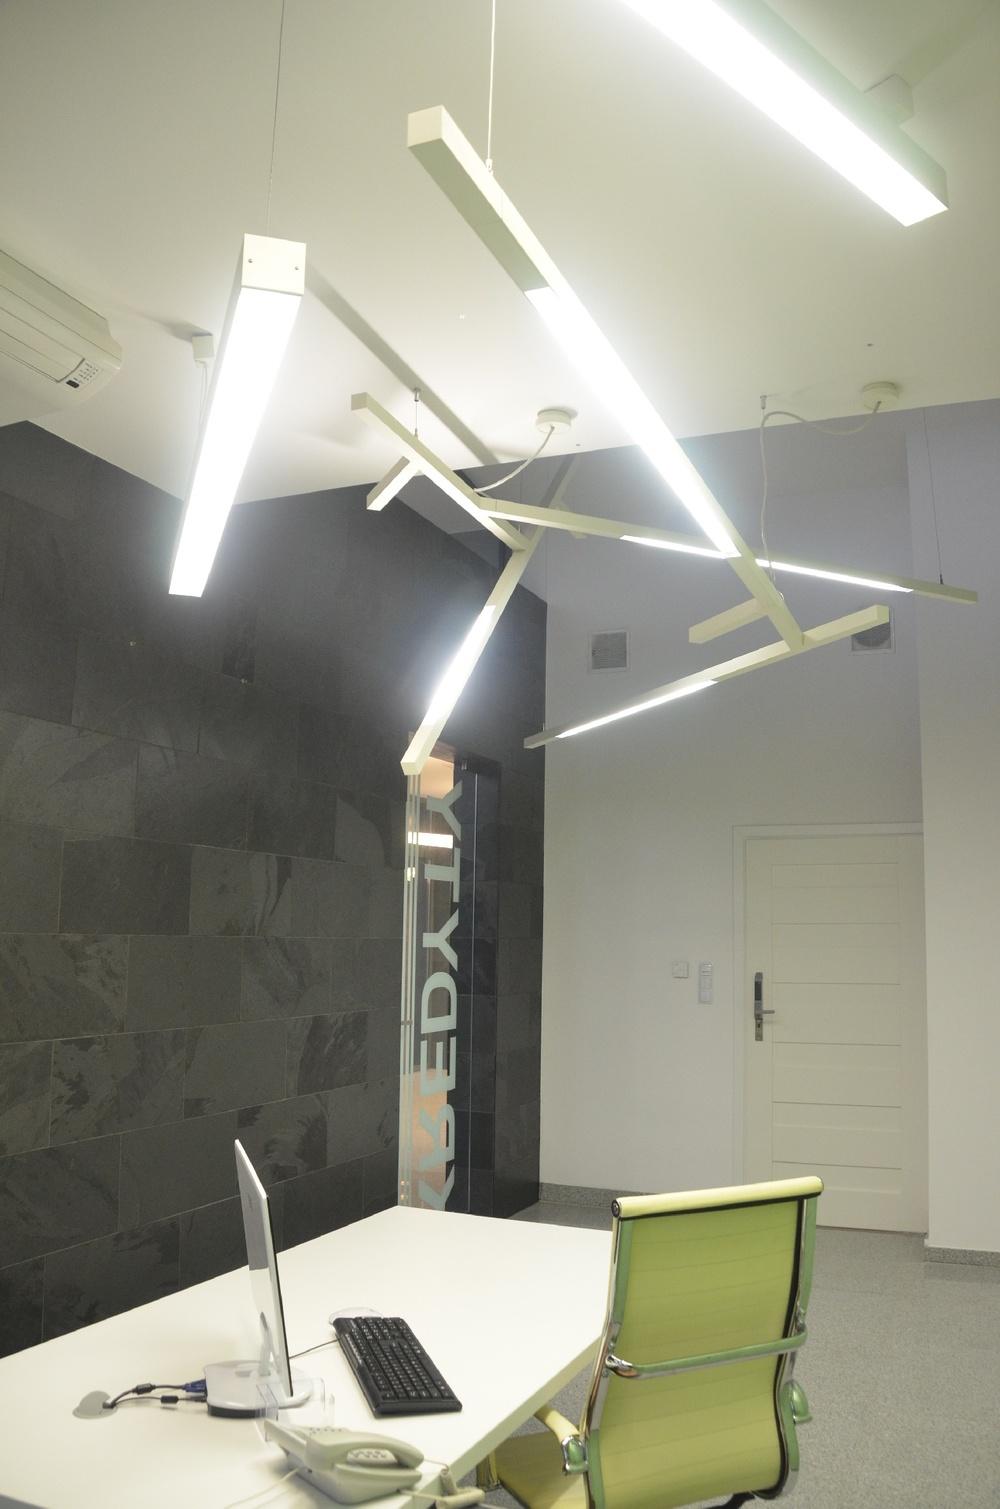 kompozycja_lamp_na_suficie.JPG